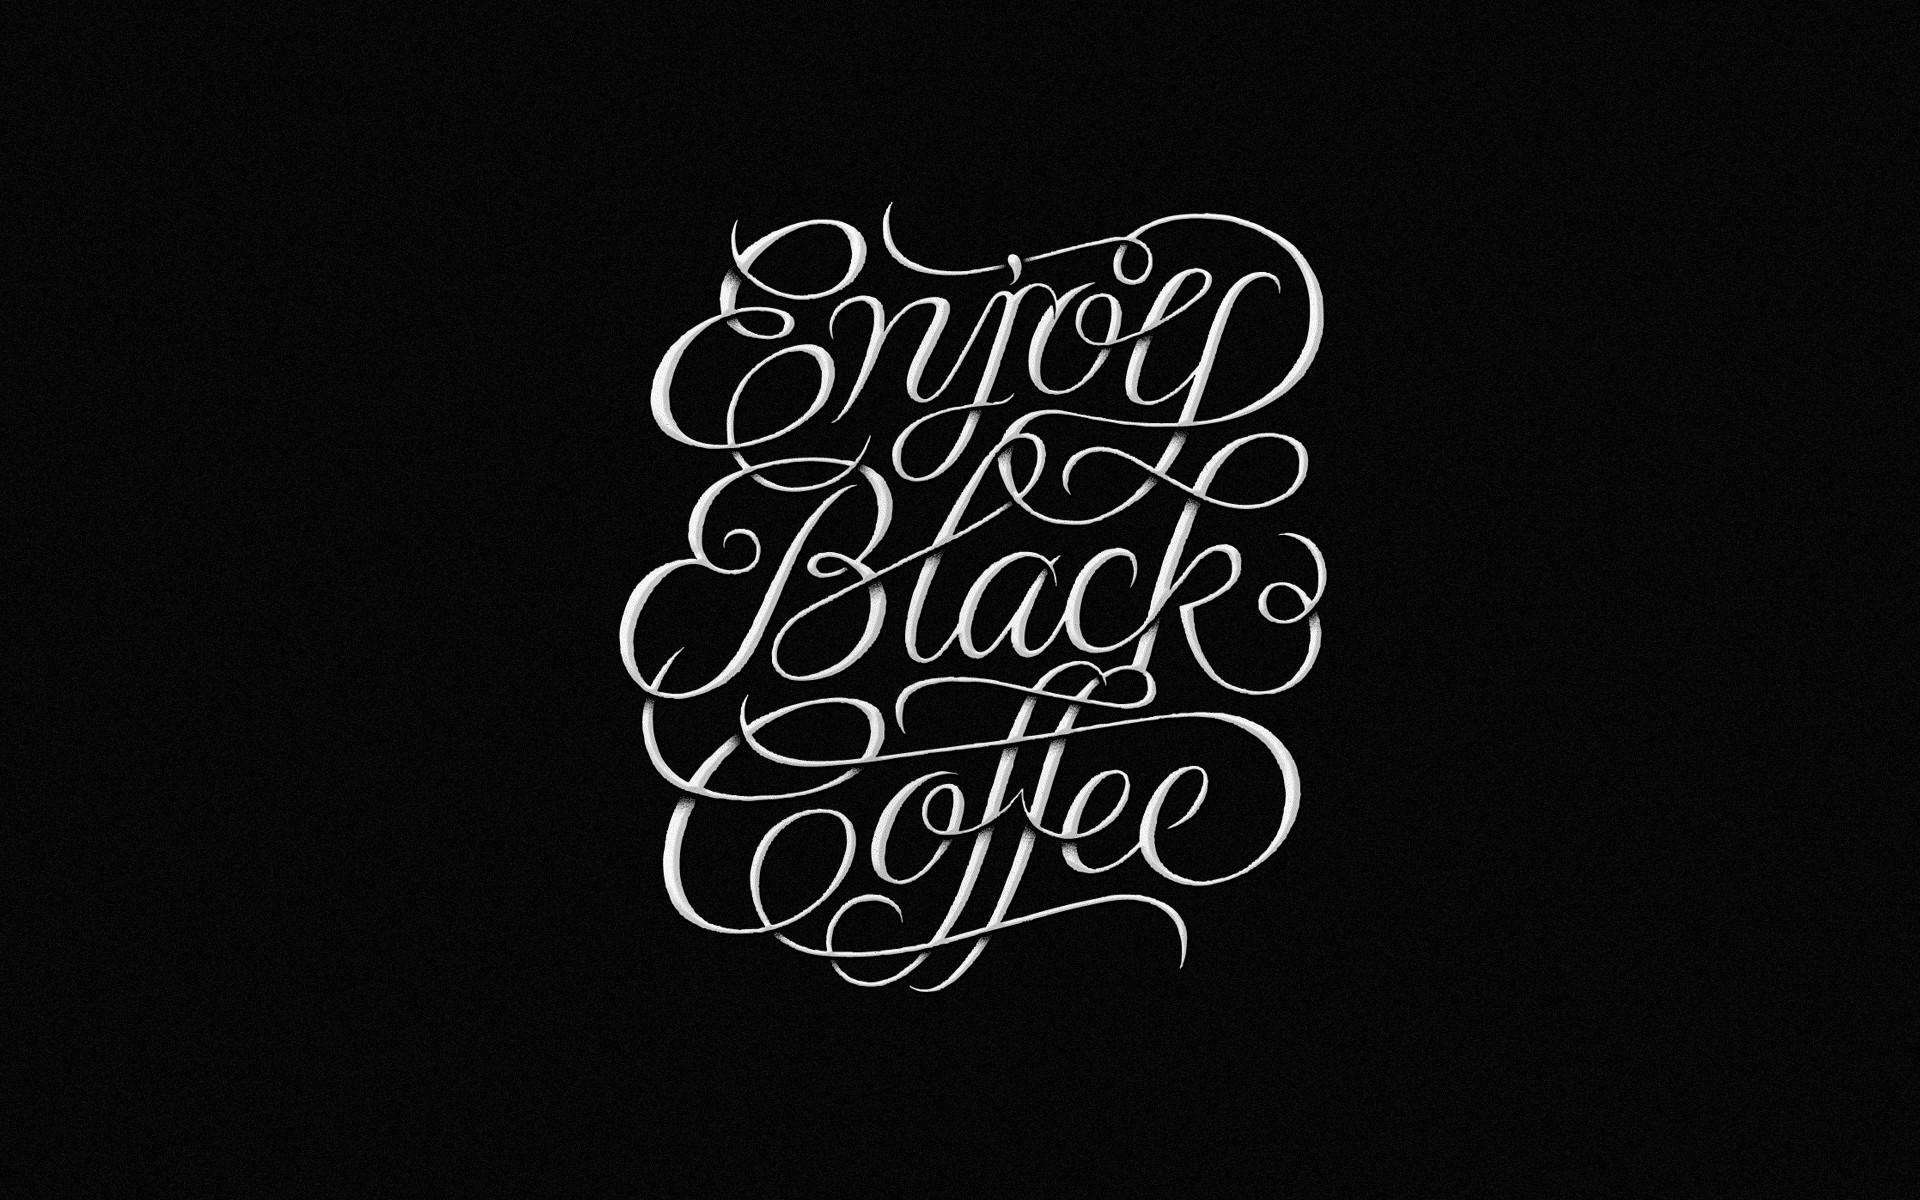 Black Coffee Friday